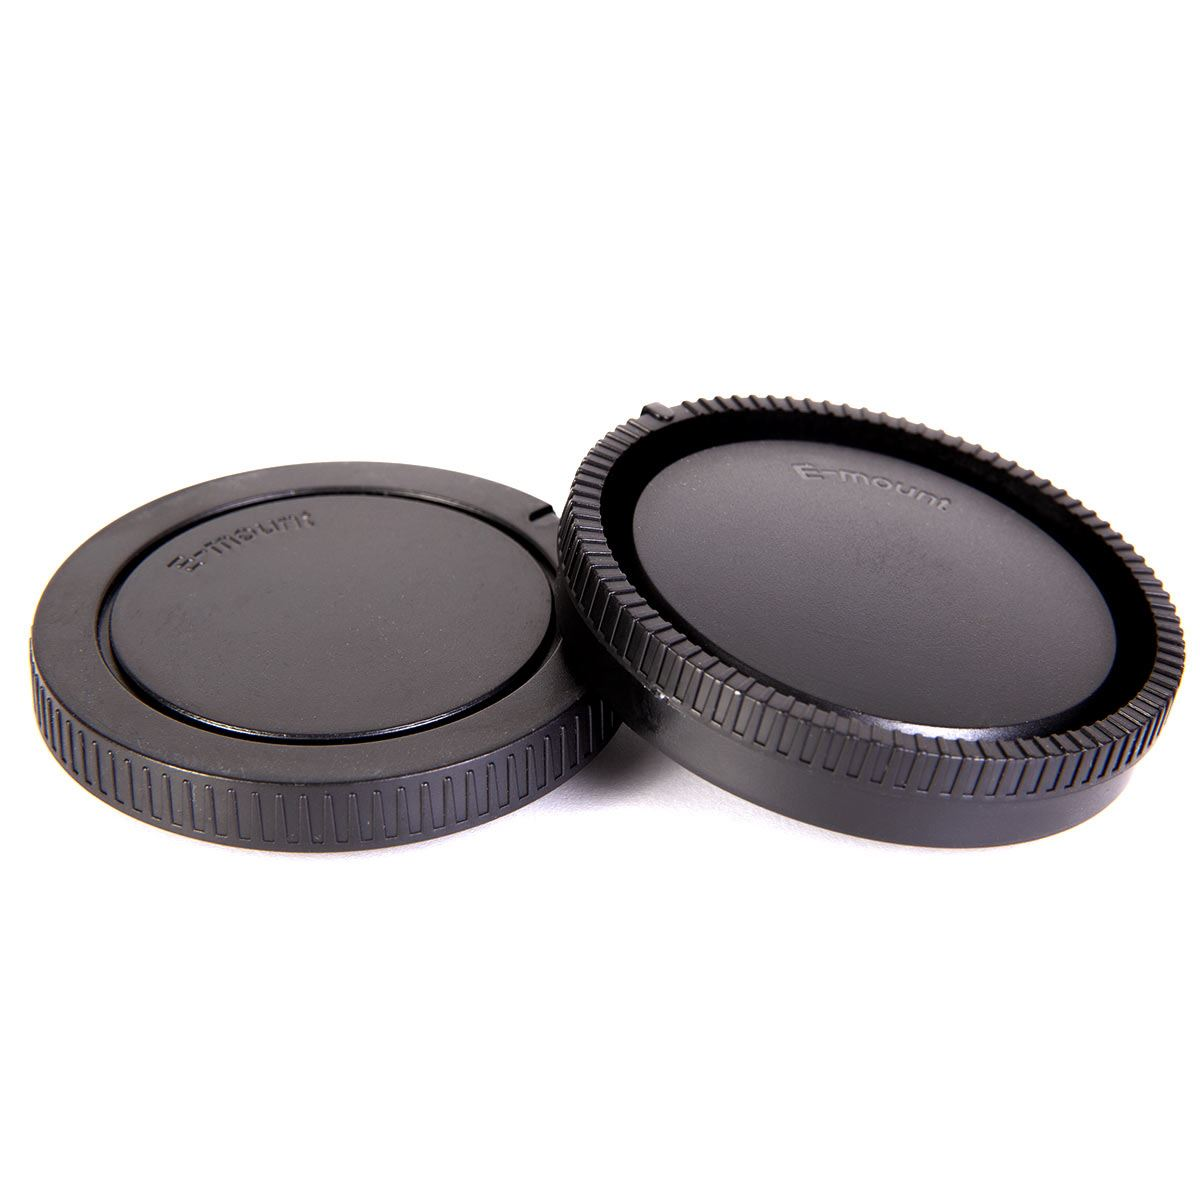 Image of Calumet Body and Rear Lens Cap Set - Sony E Fit